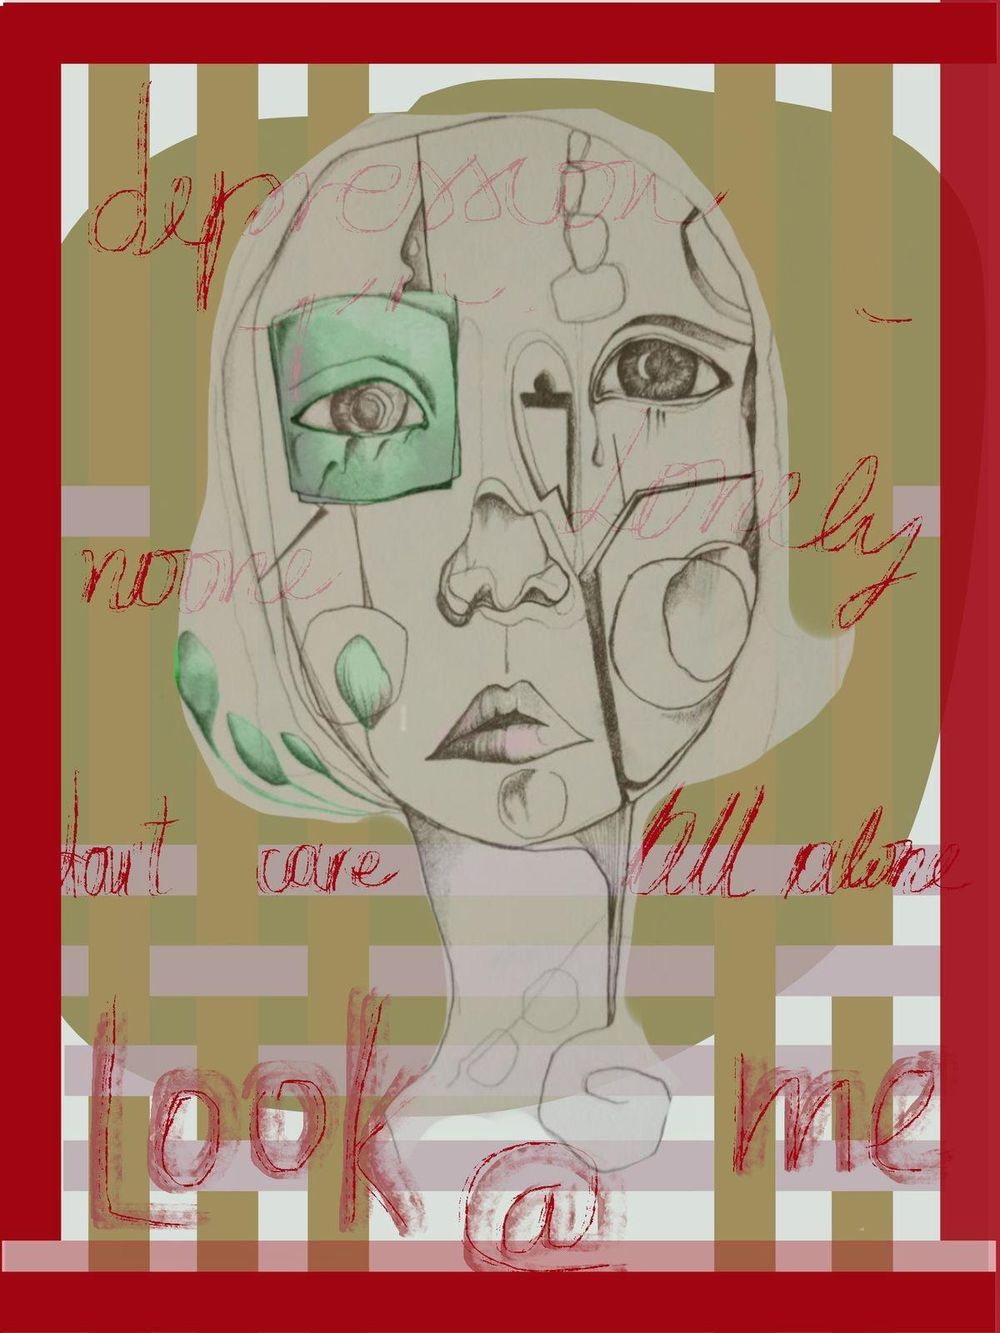 Art>Change>Mental Health - image 1 - student project